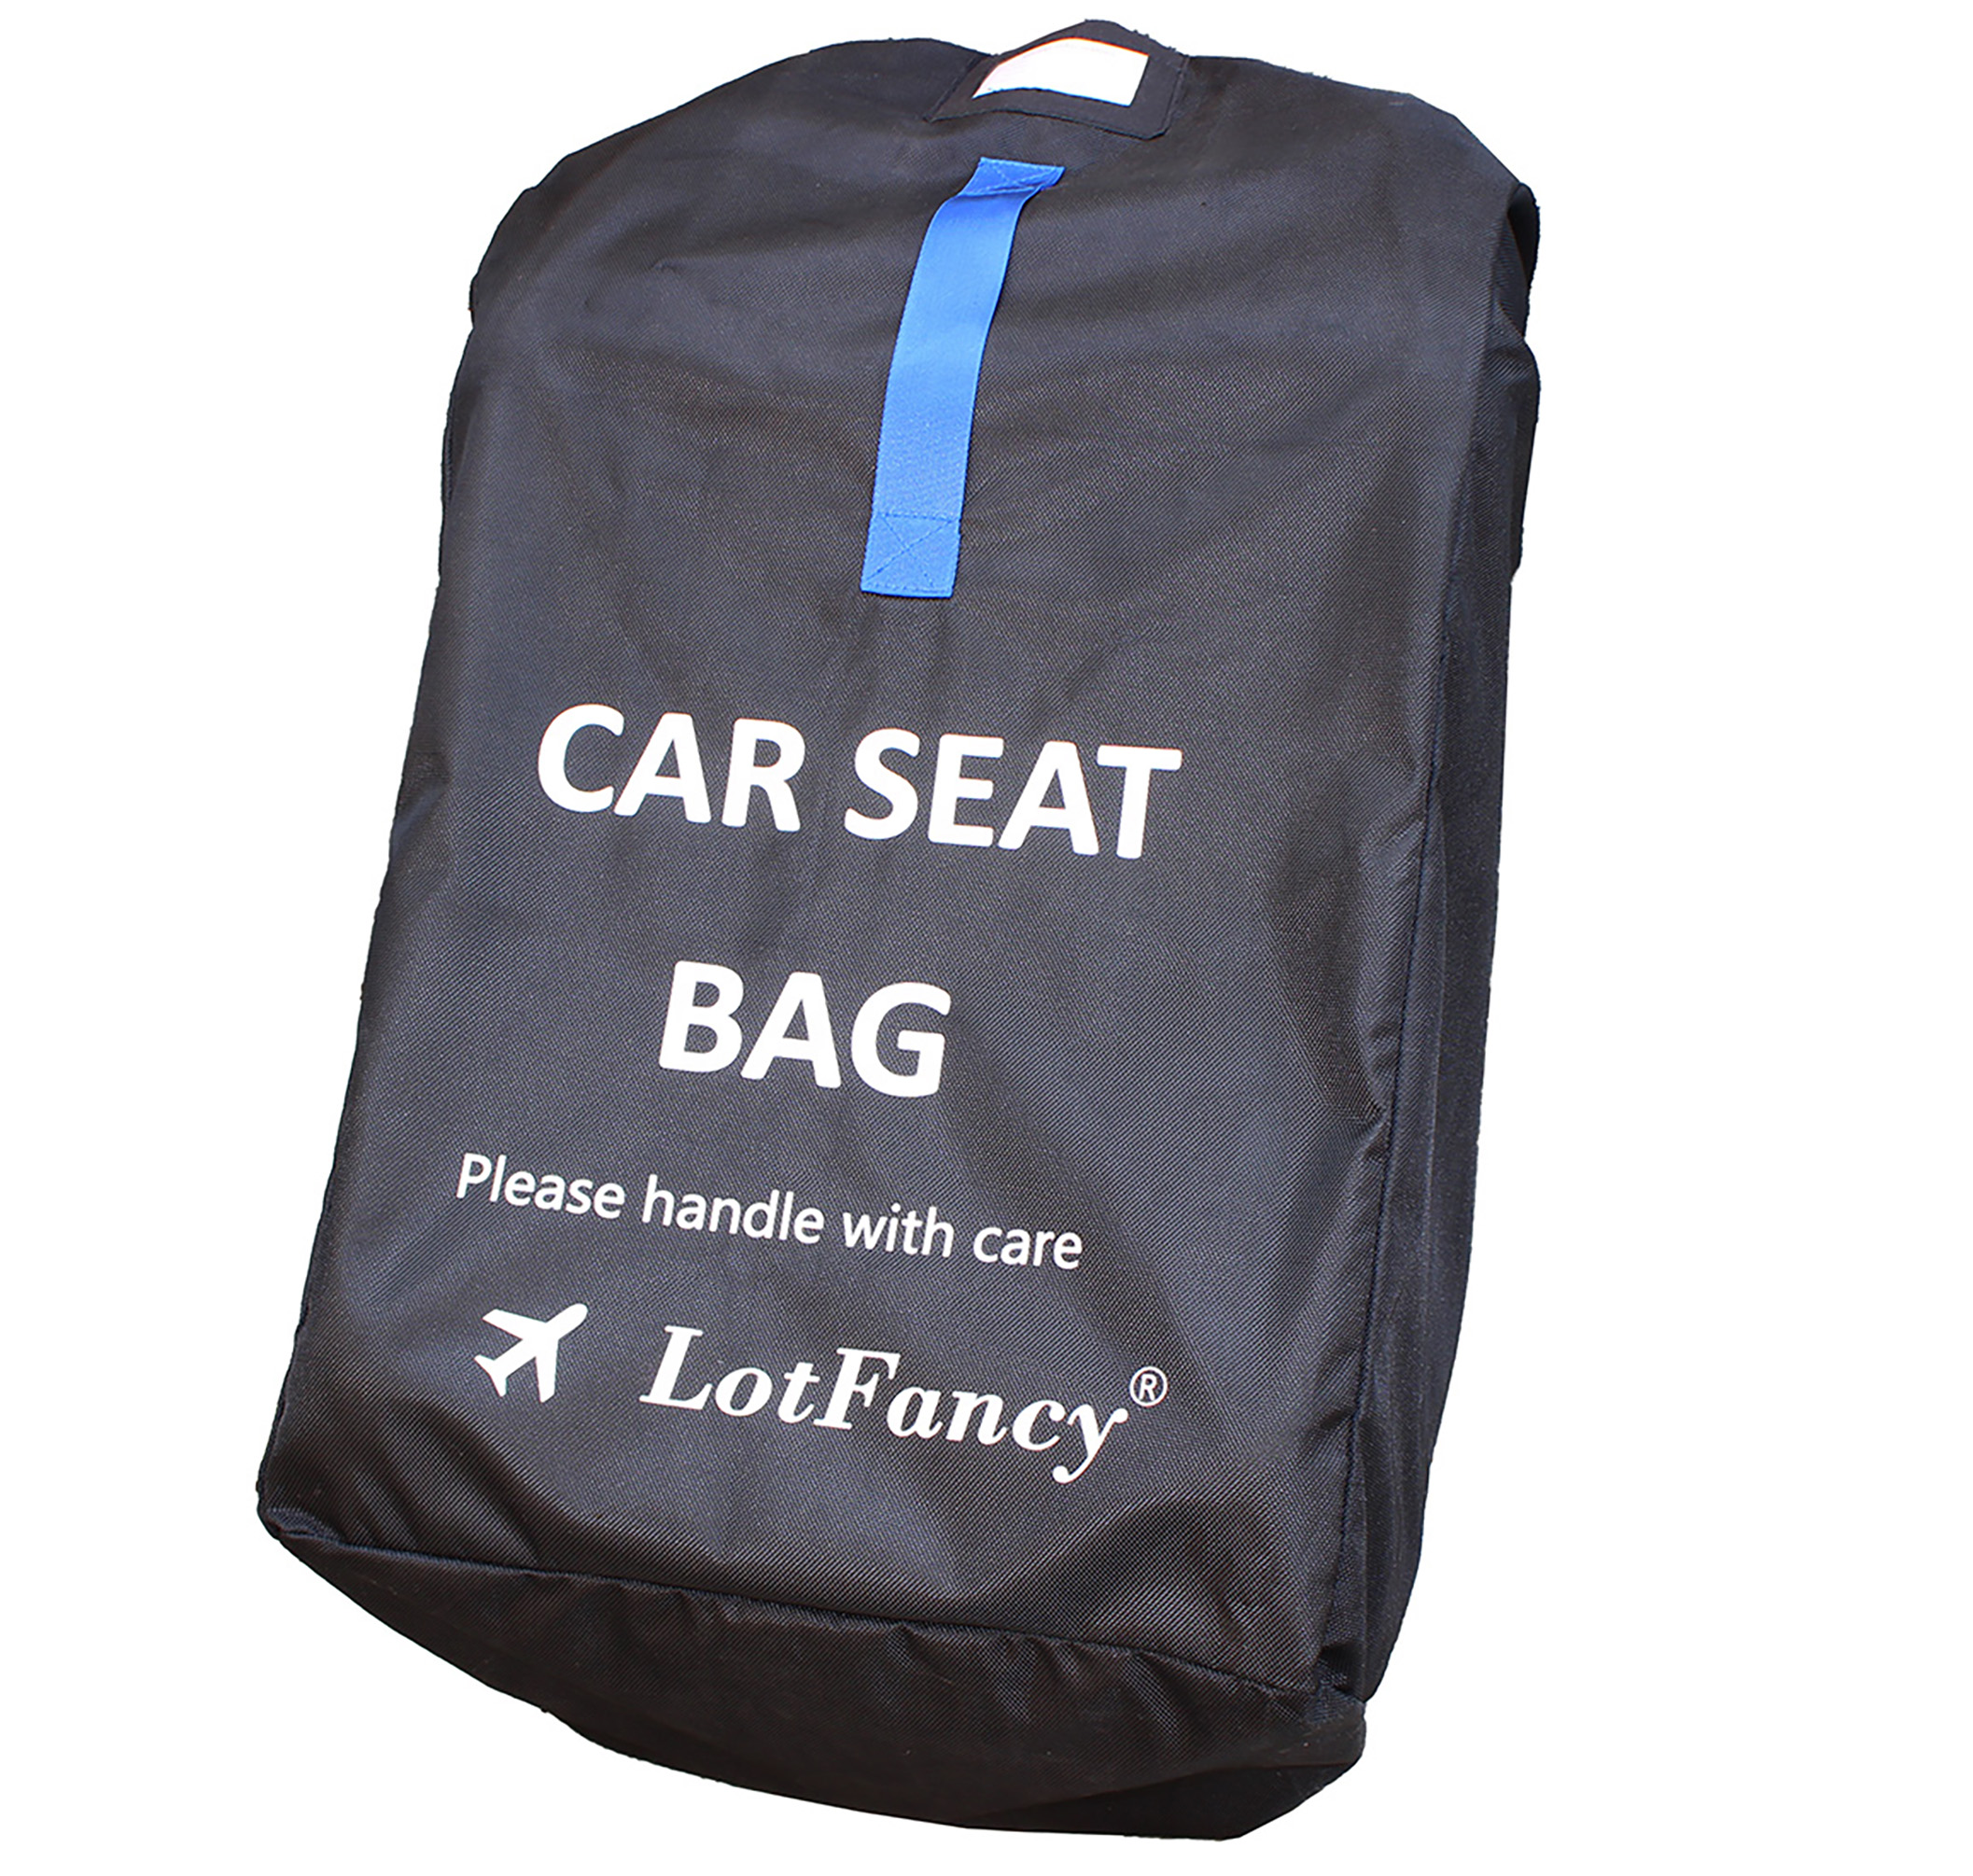 Lotfancy Car Seat Travel Bag With Shoulder Straps Zipper Pouch